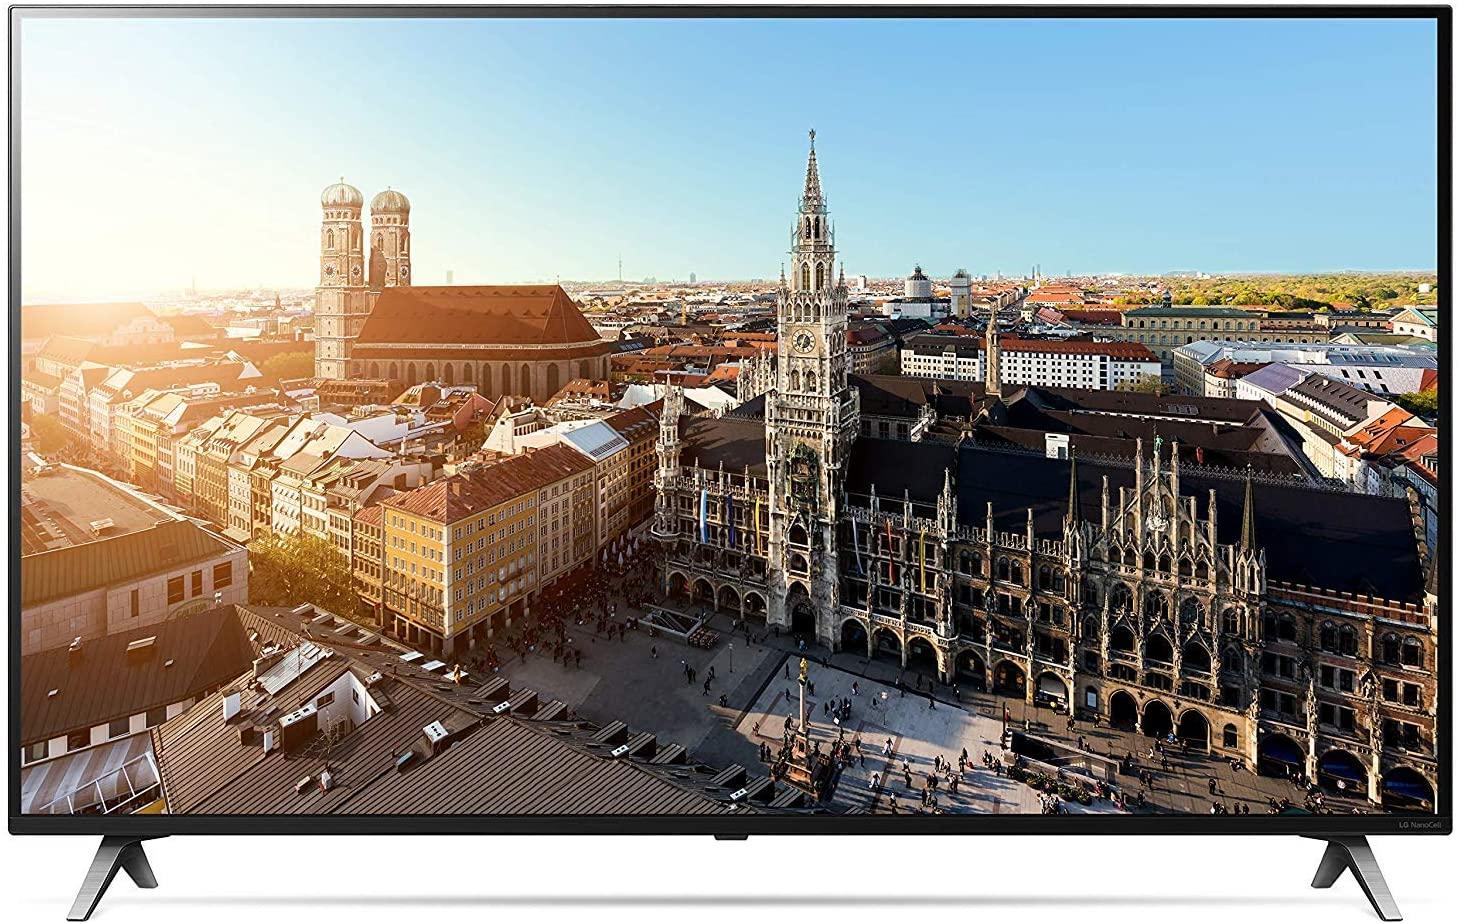 "LG 65SM8500PLA 164 cm - 65"" Fernseher (NanoCell, 100 Hz, Triple Tuner, 4K Cinema HDR, Dolby Vision, Dolby Atmos, Alexa-Integration) [Amazon]"